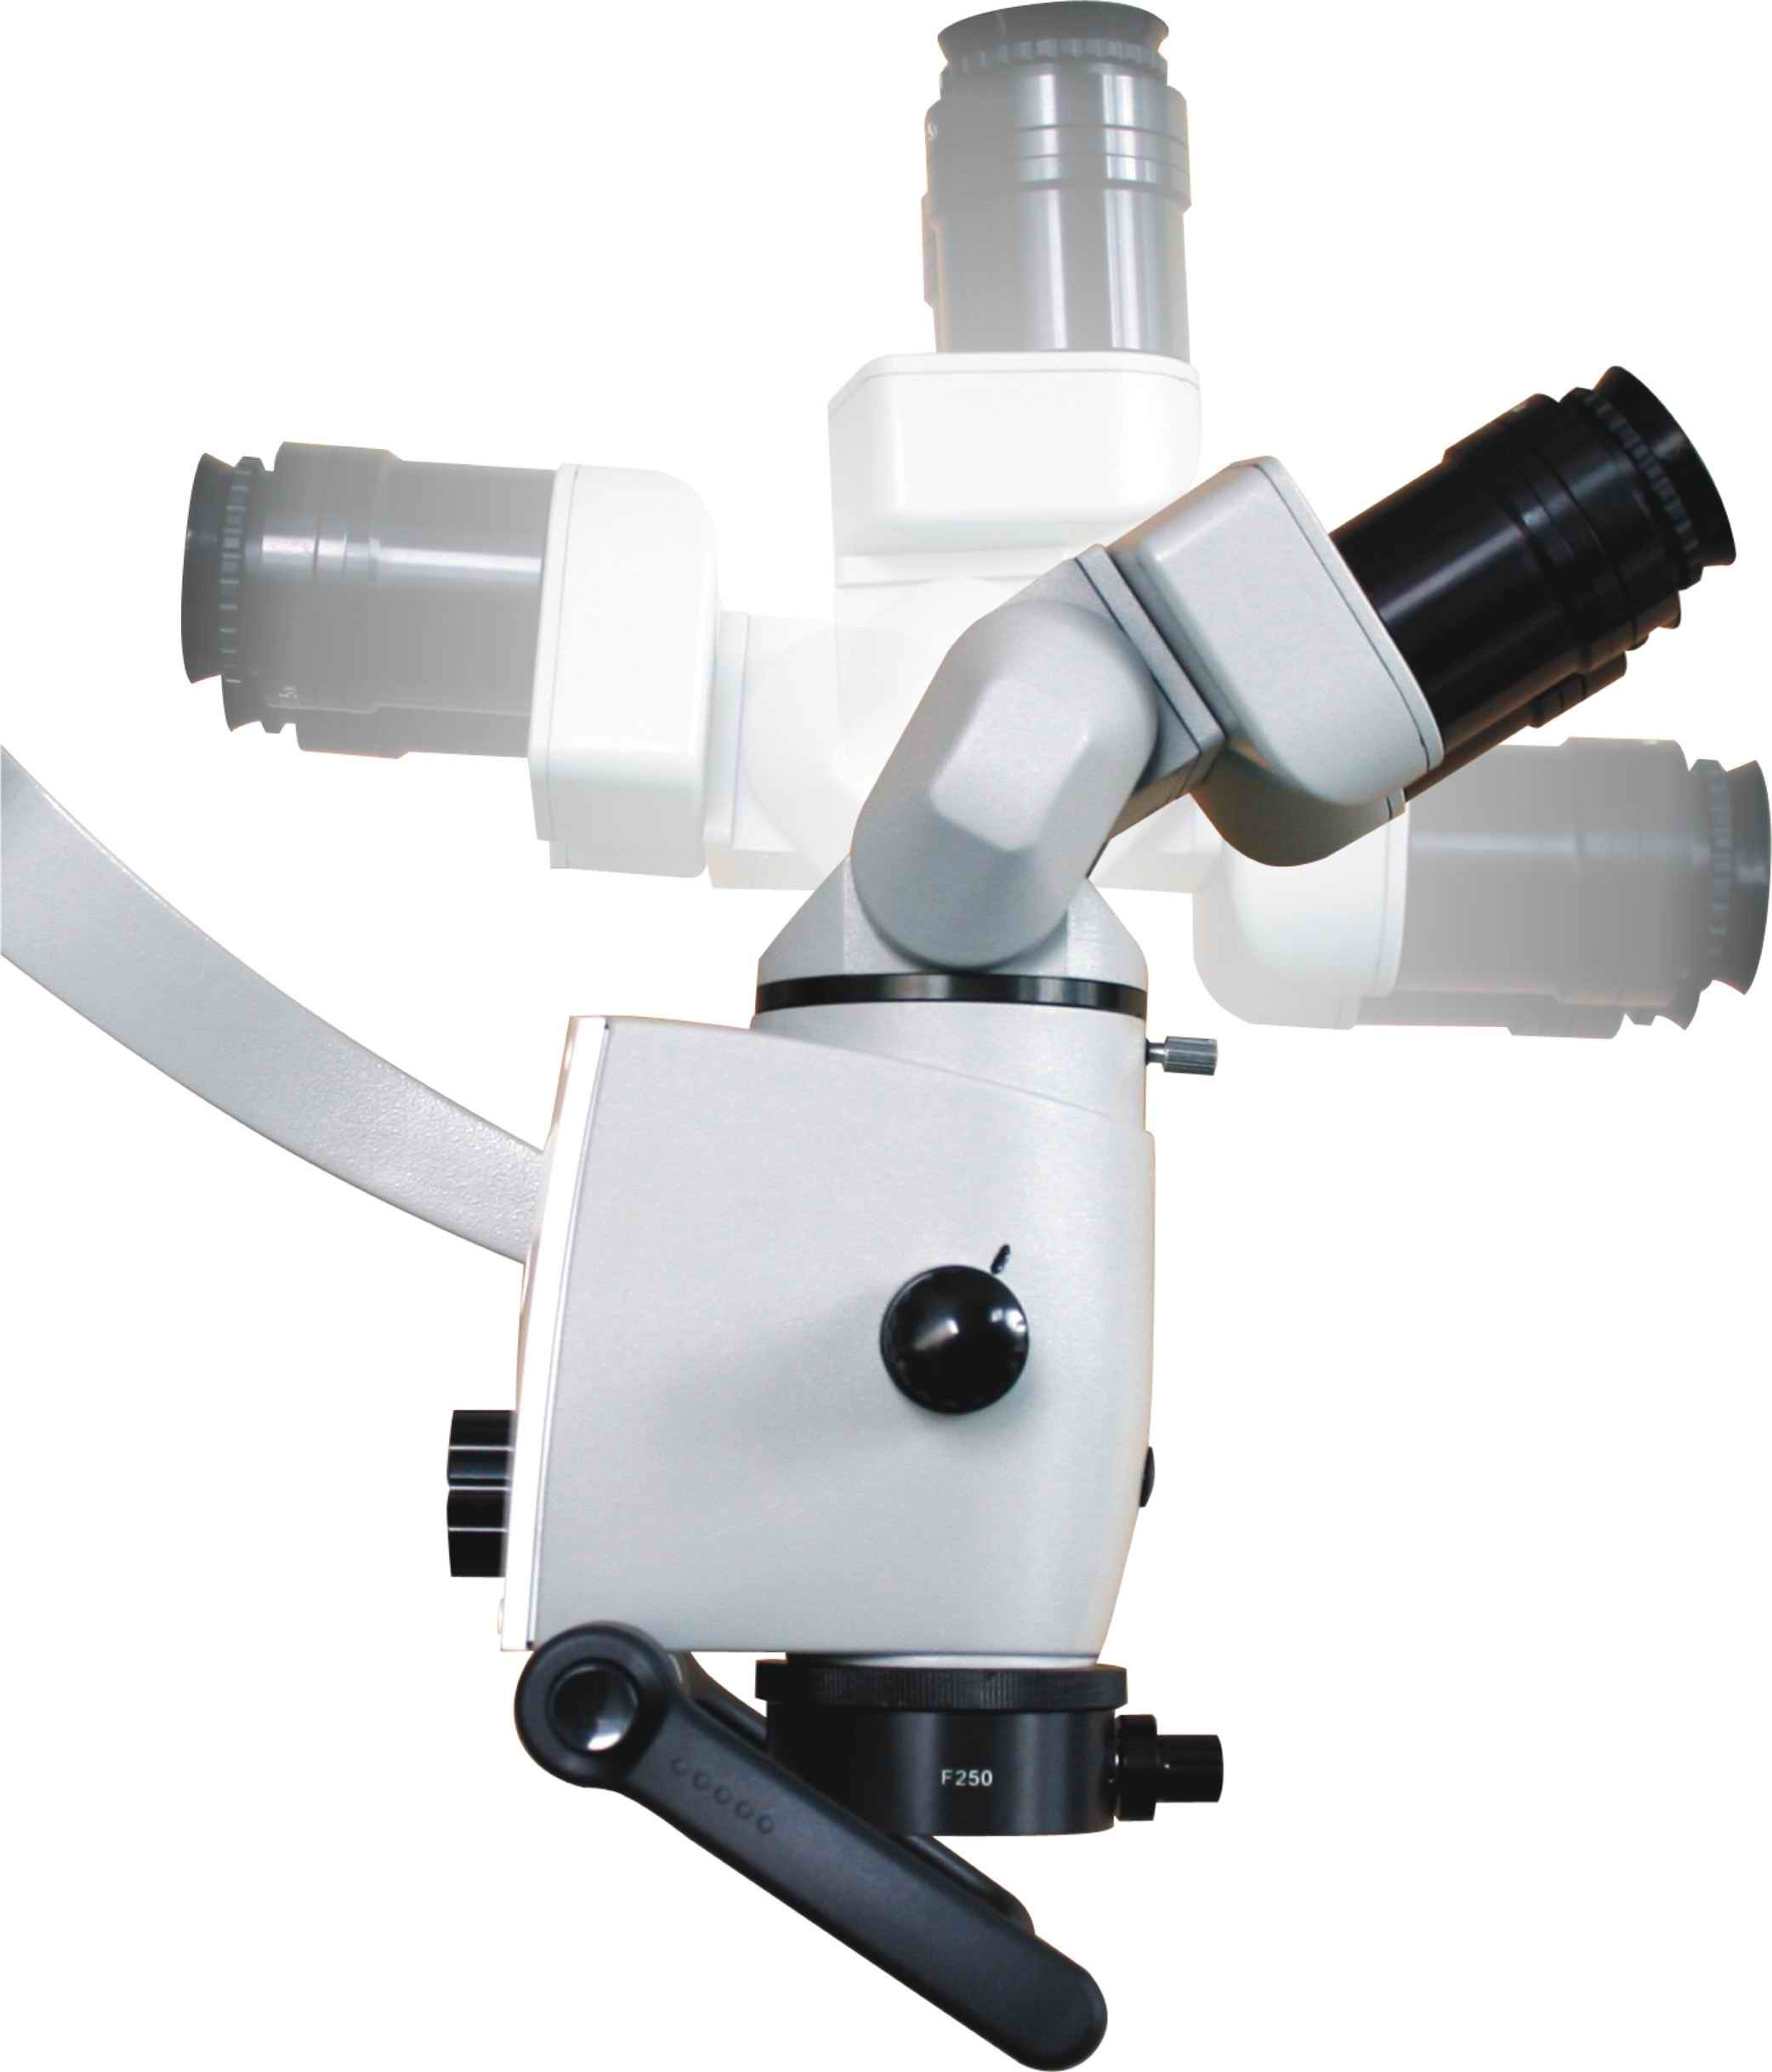 DSLR Microscope Adapter (OMS2300)